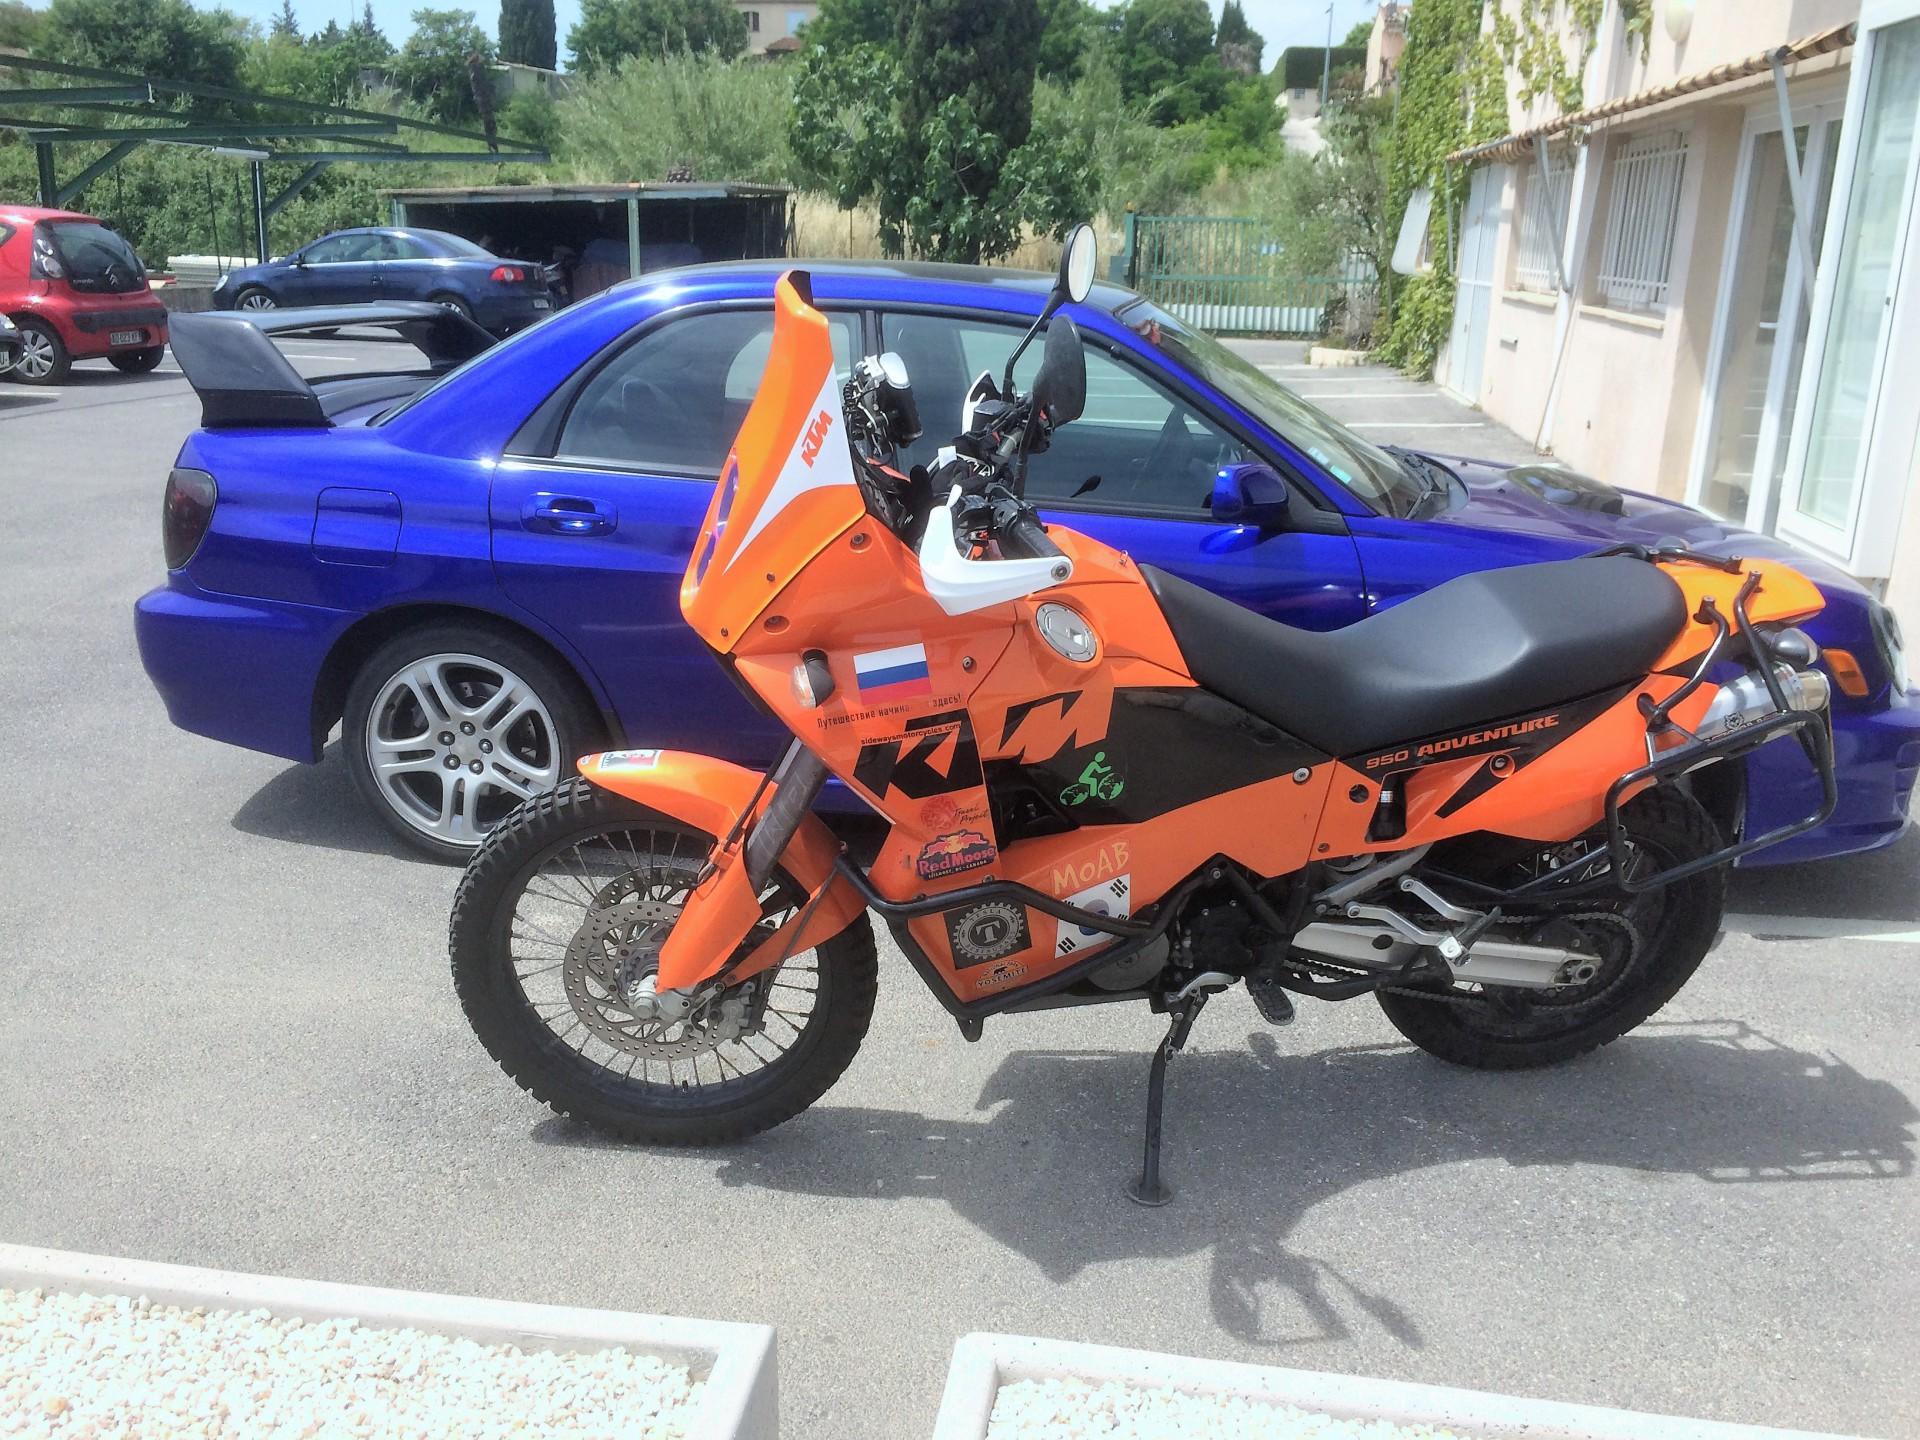 car vinyl wrap, motorbike vinyl wrap, Subaru, KTM